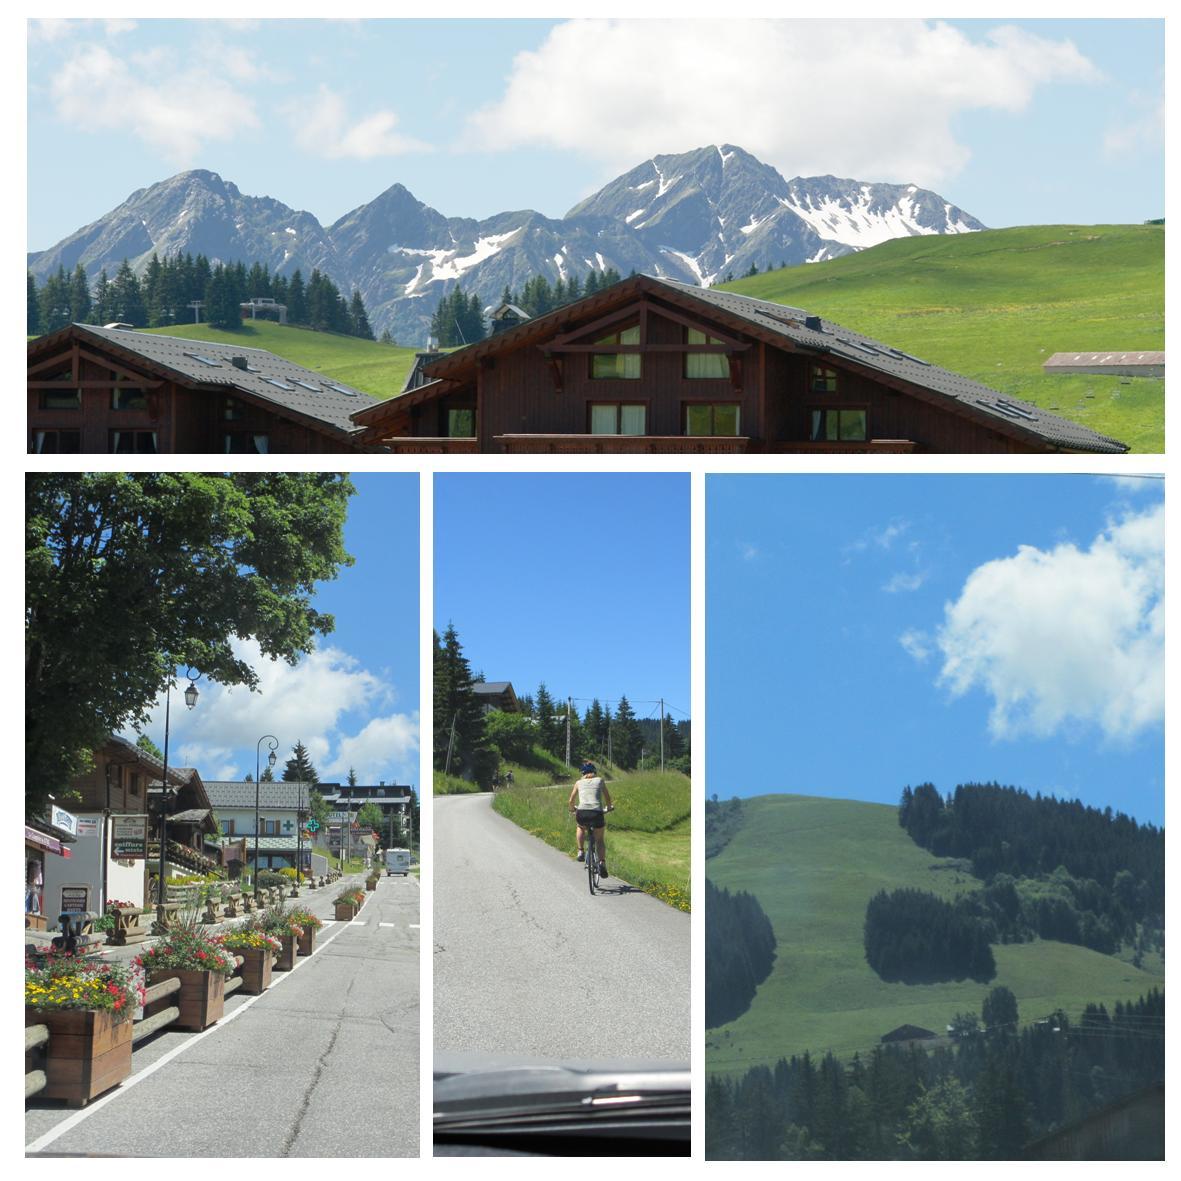 Alpelandskap - bilferie i franske alper